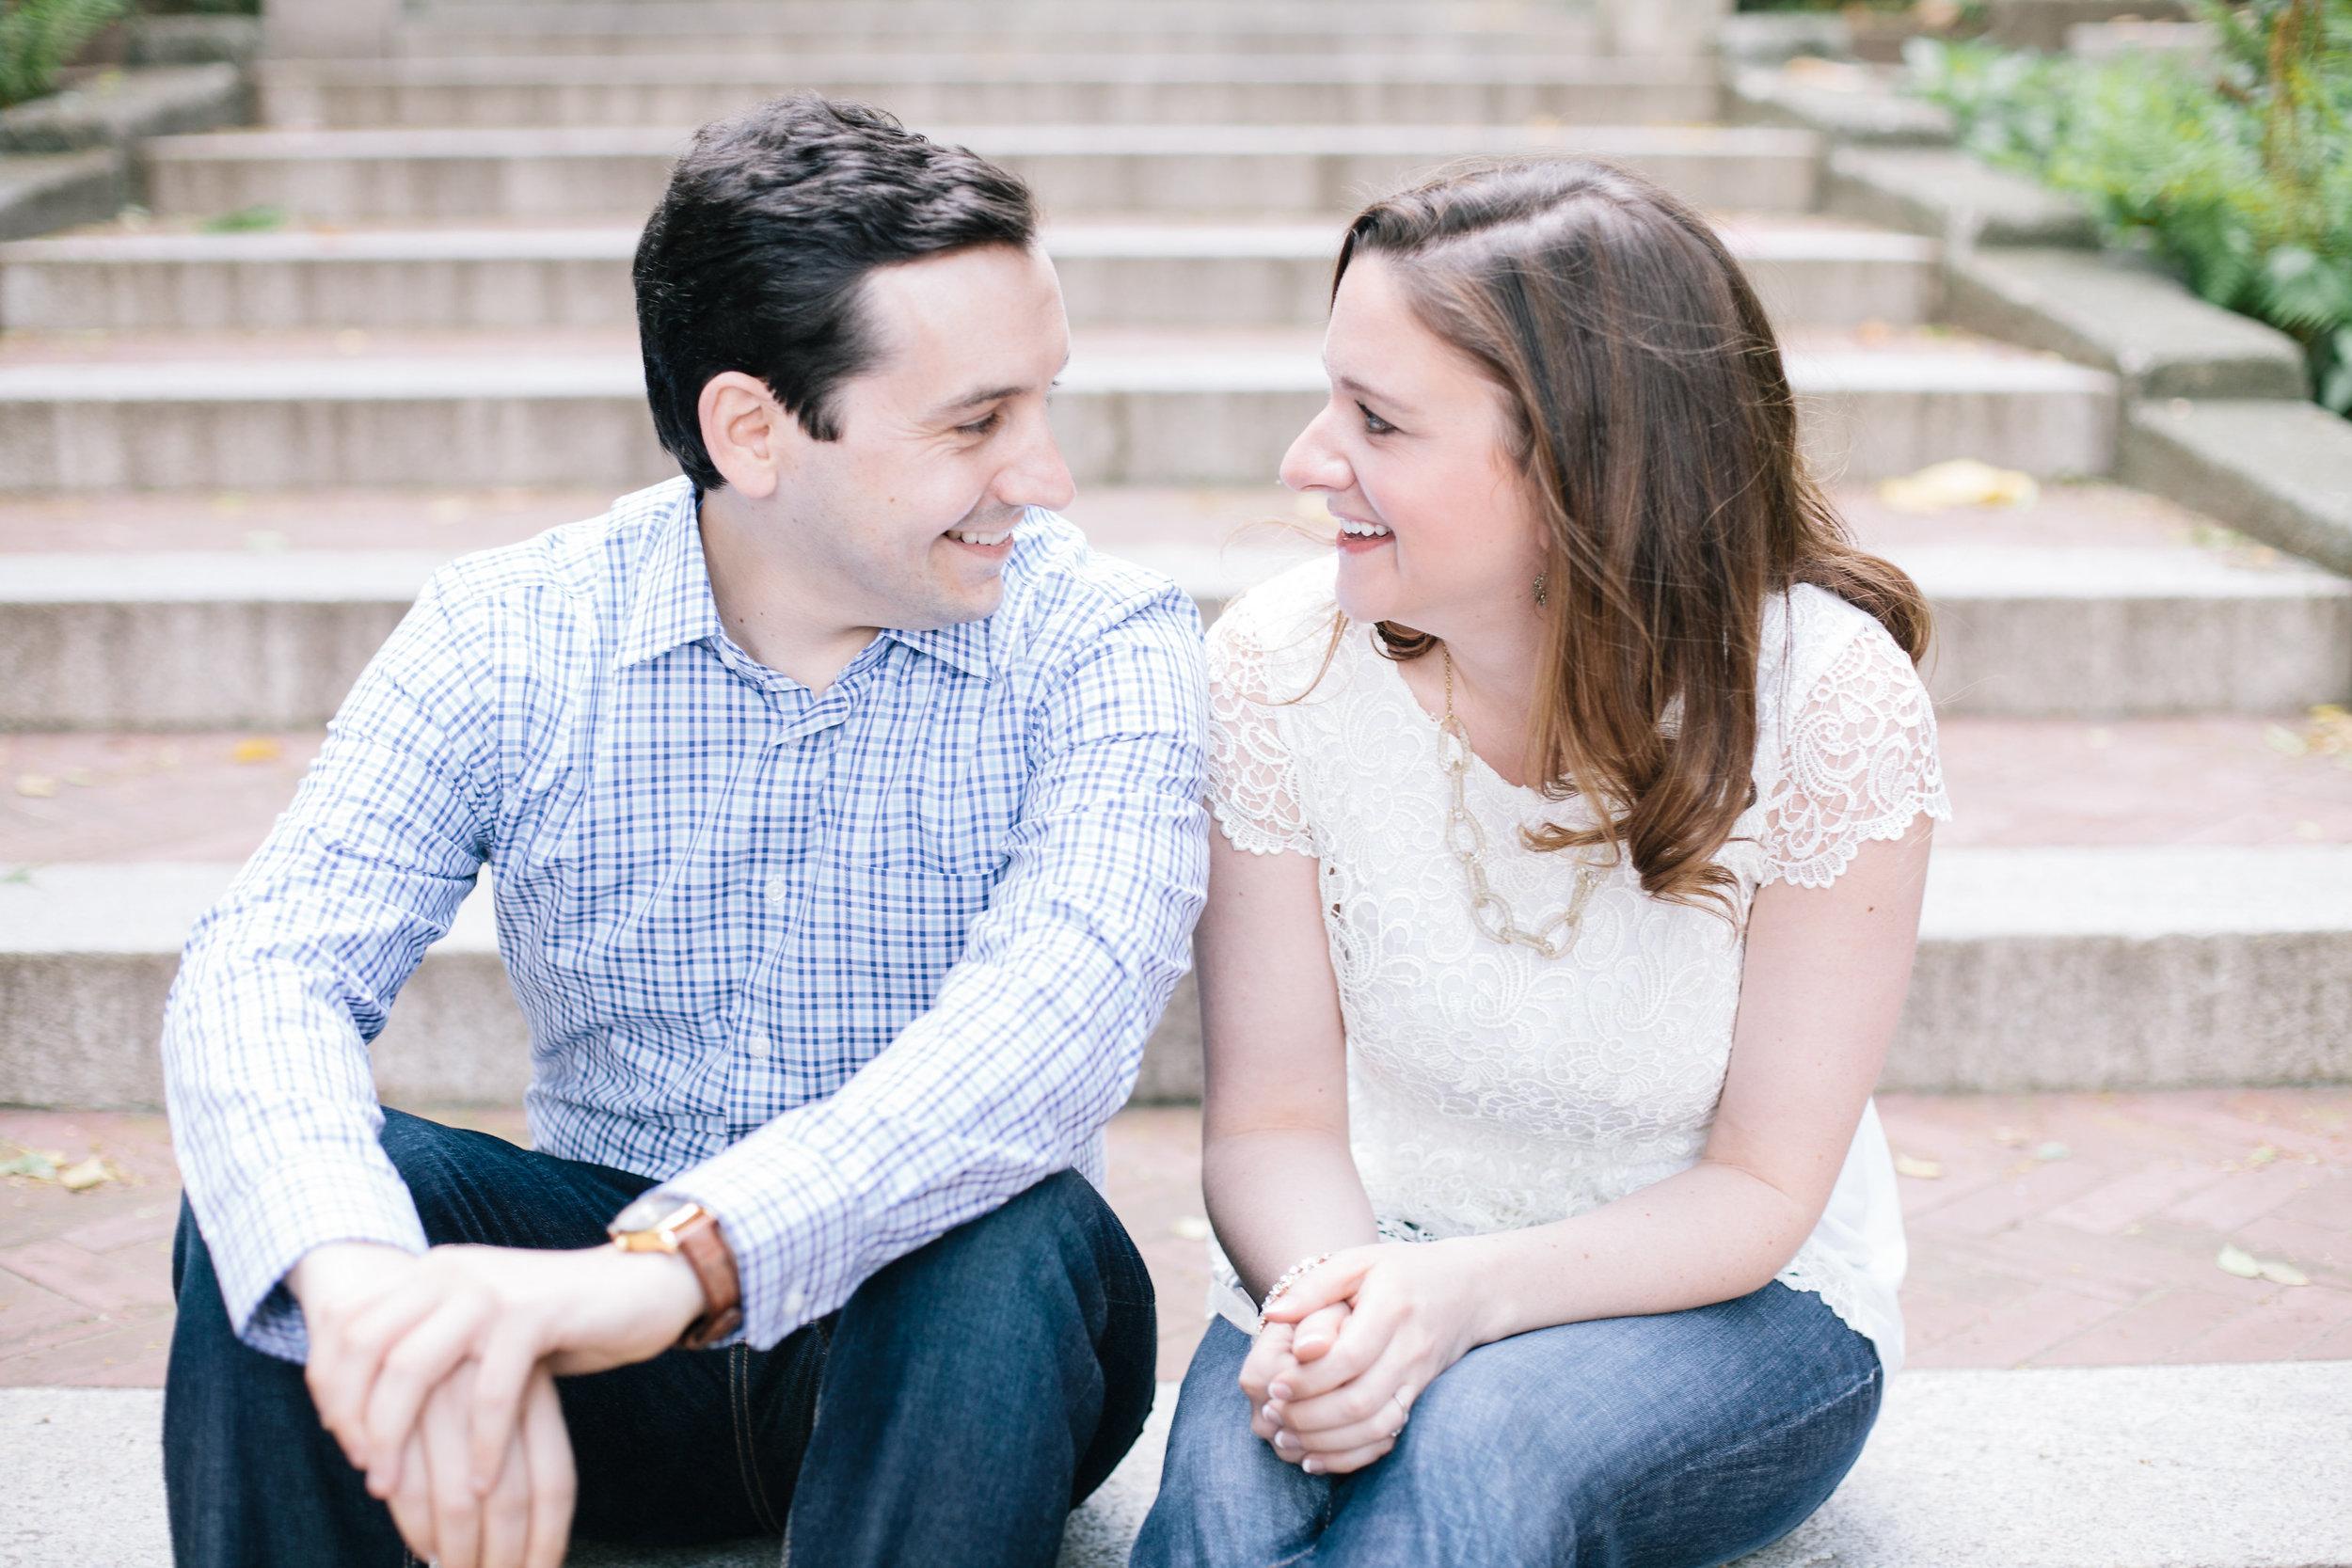 Megan & Jeff (Washington, D.C.)